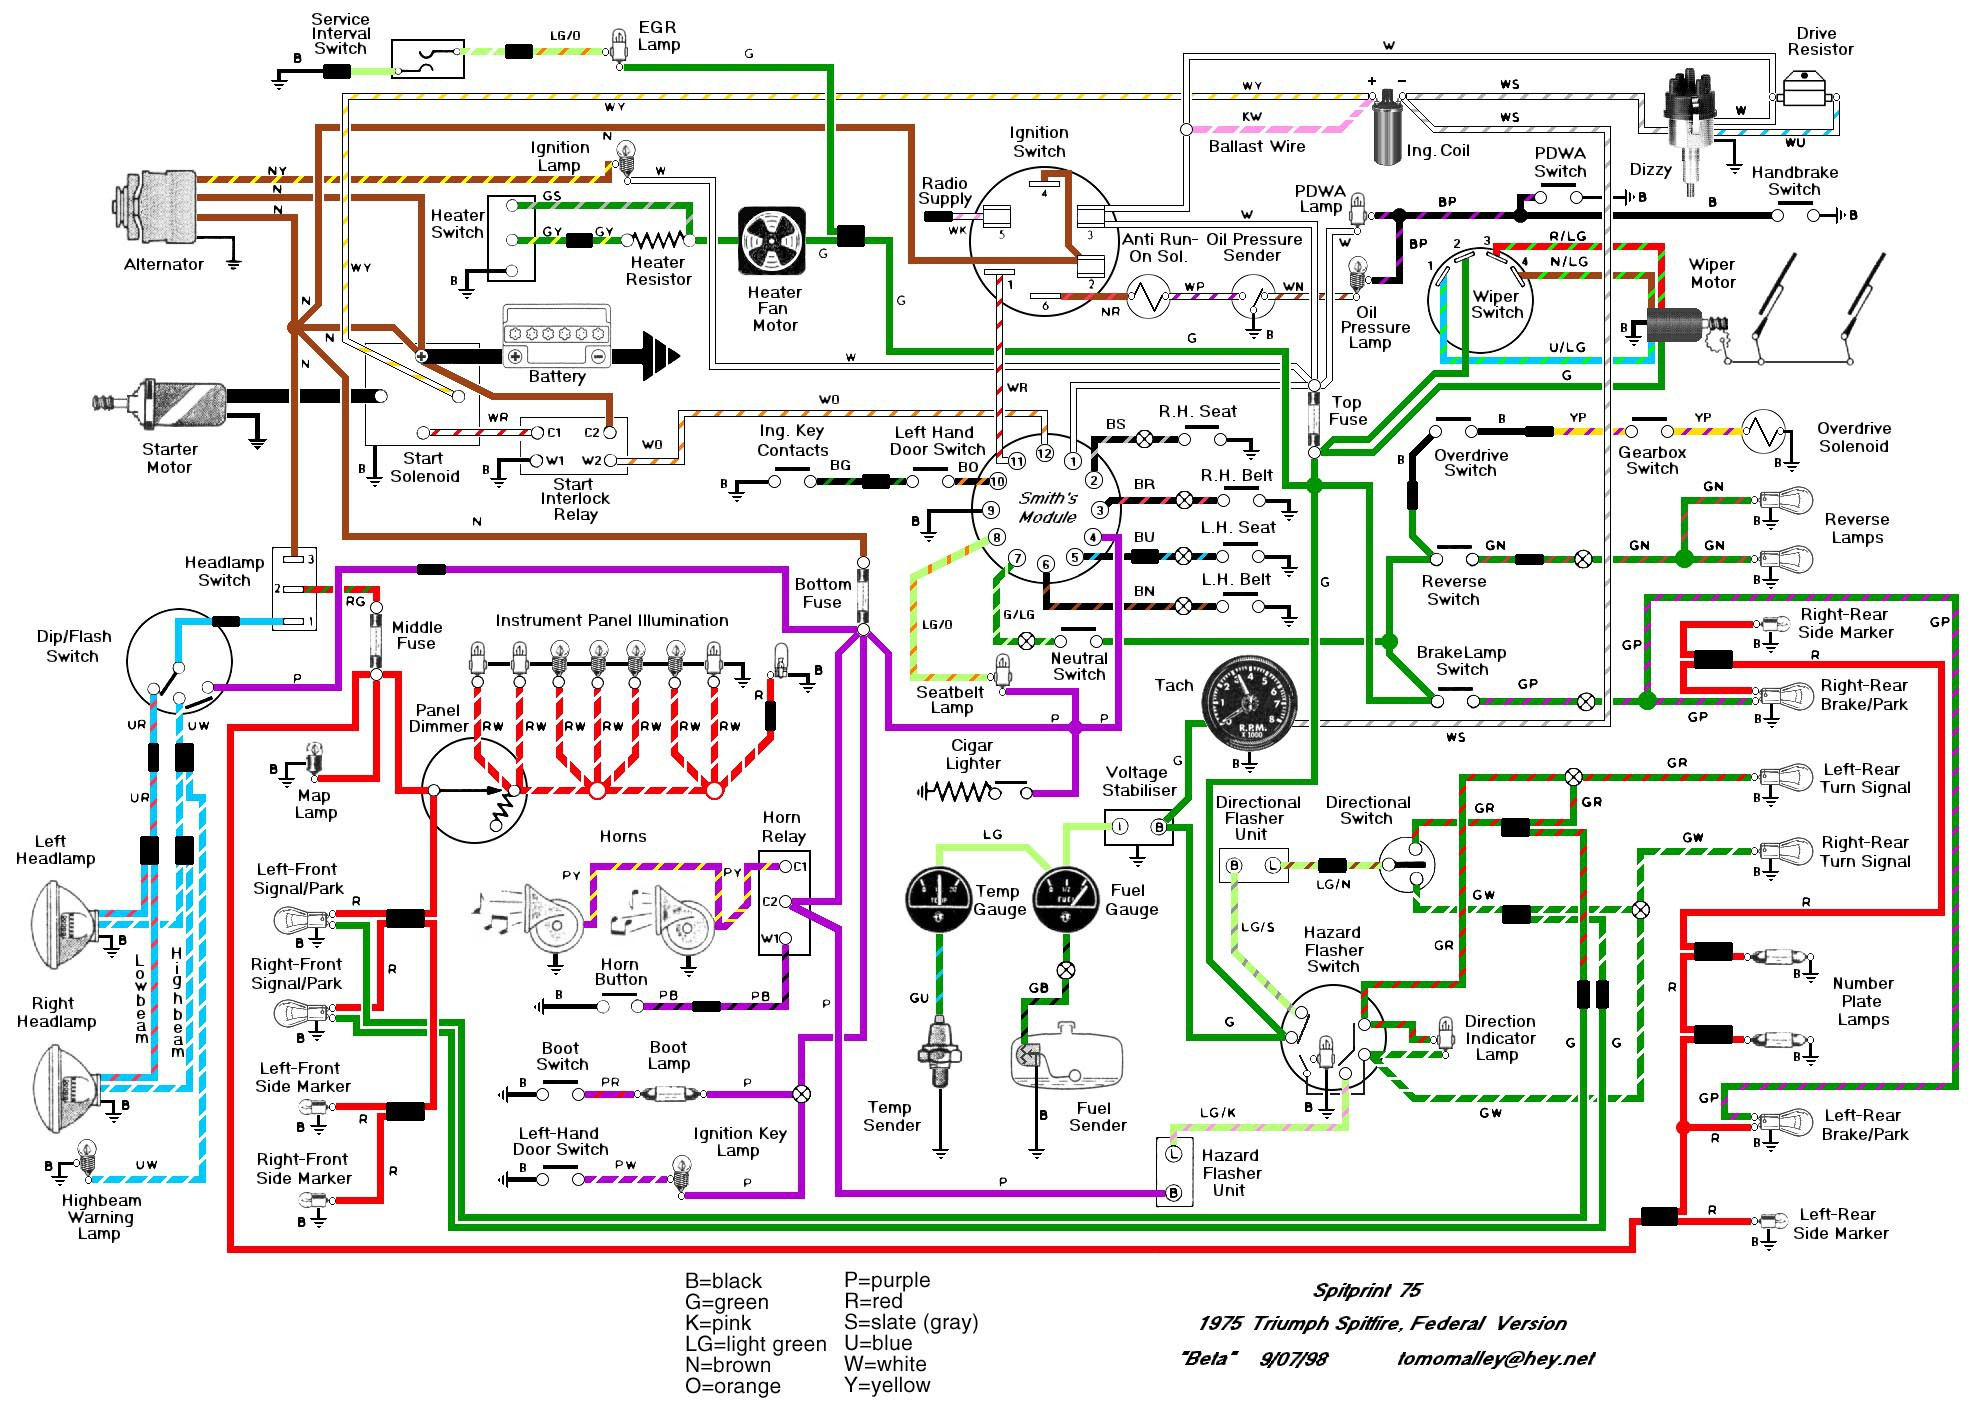 Help Ez Wiring Harness Diagrams - Wiring Diagram 500 Ez Wiring Harness Circuit on ez wiring harness light, ez go rxv wiring relay, ez wiring harness kit, ez wiring harness 93 mustang,